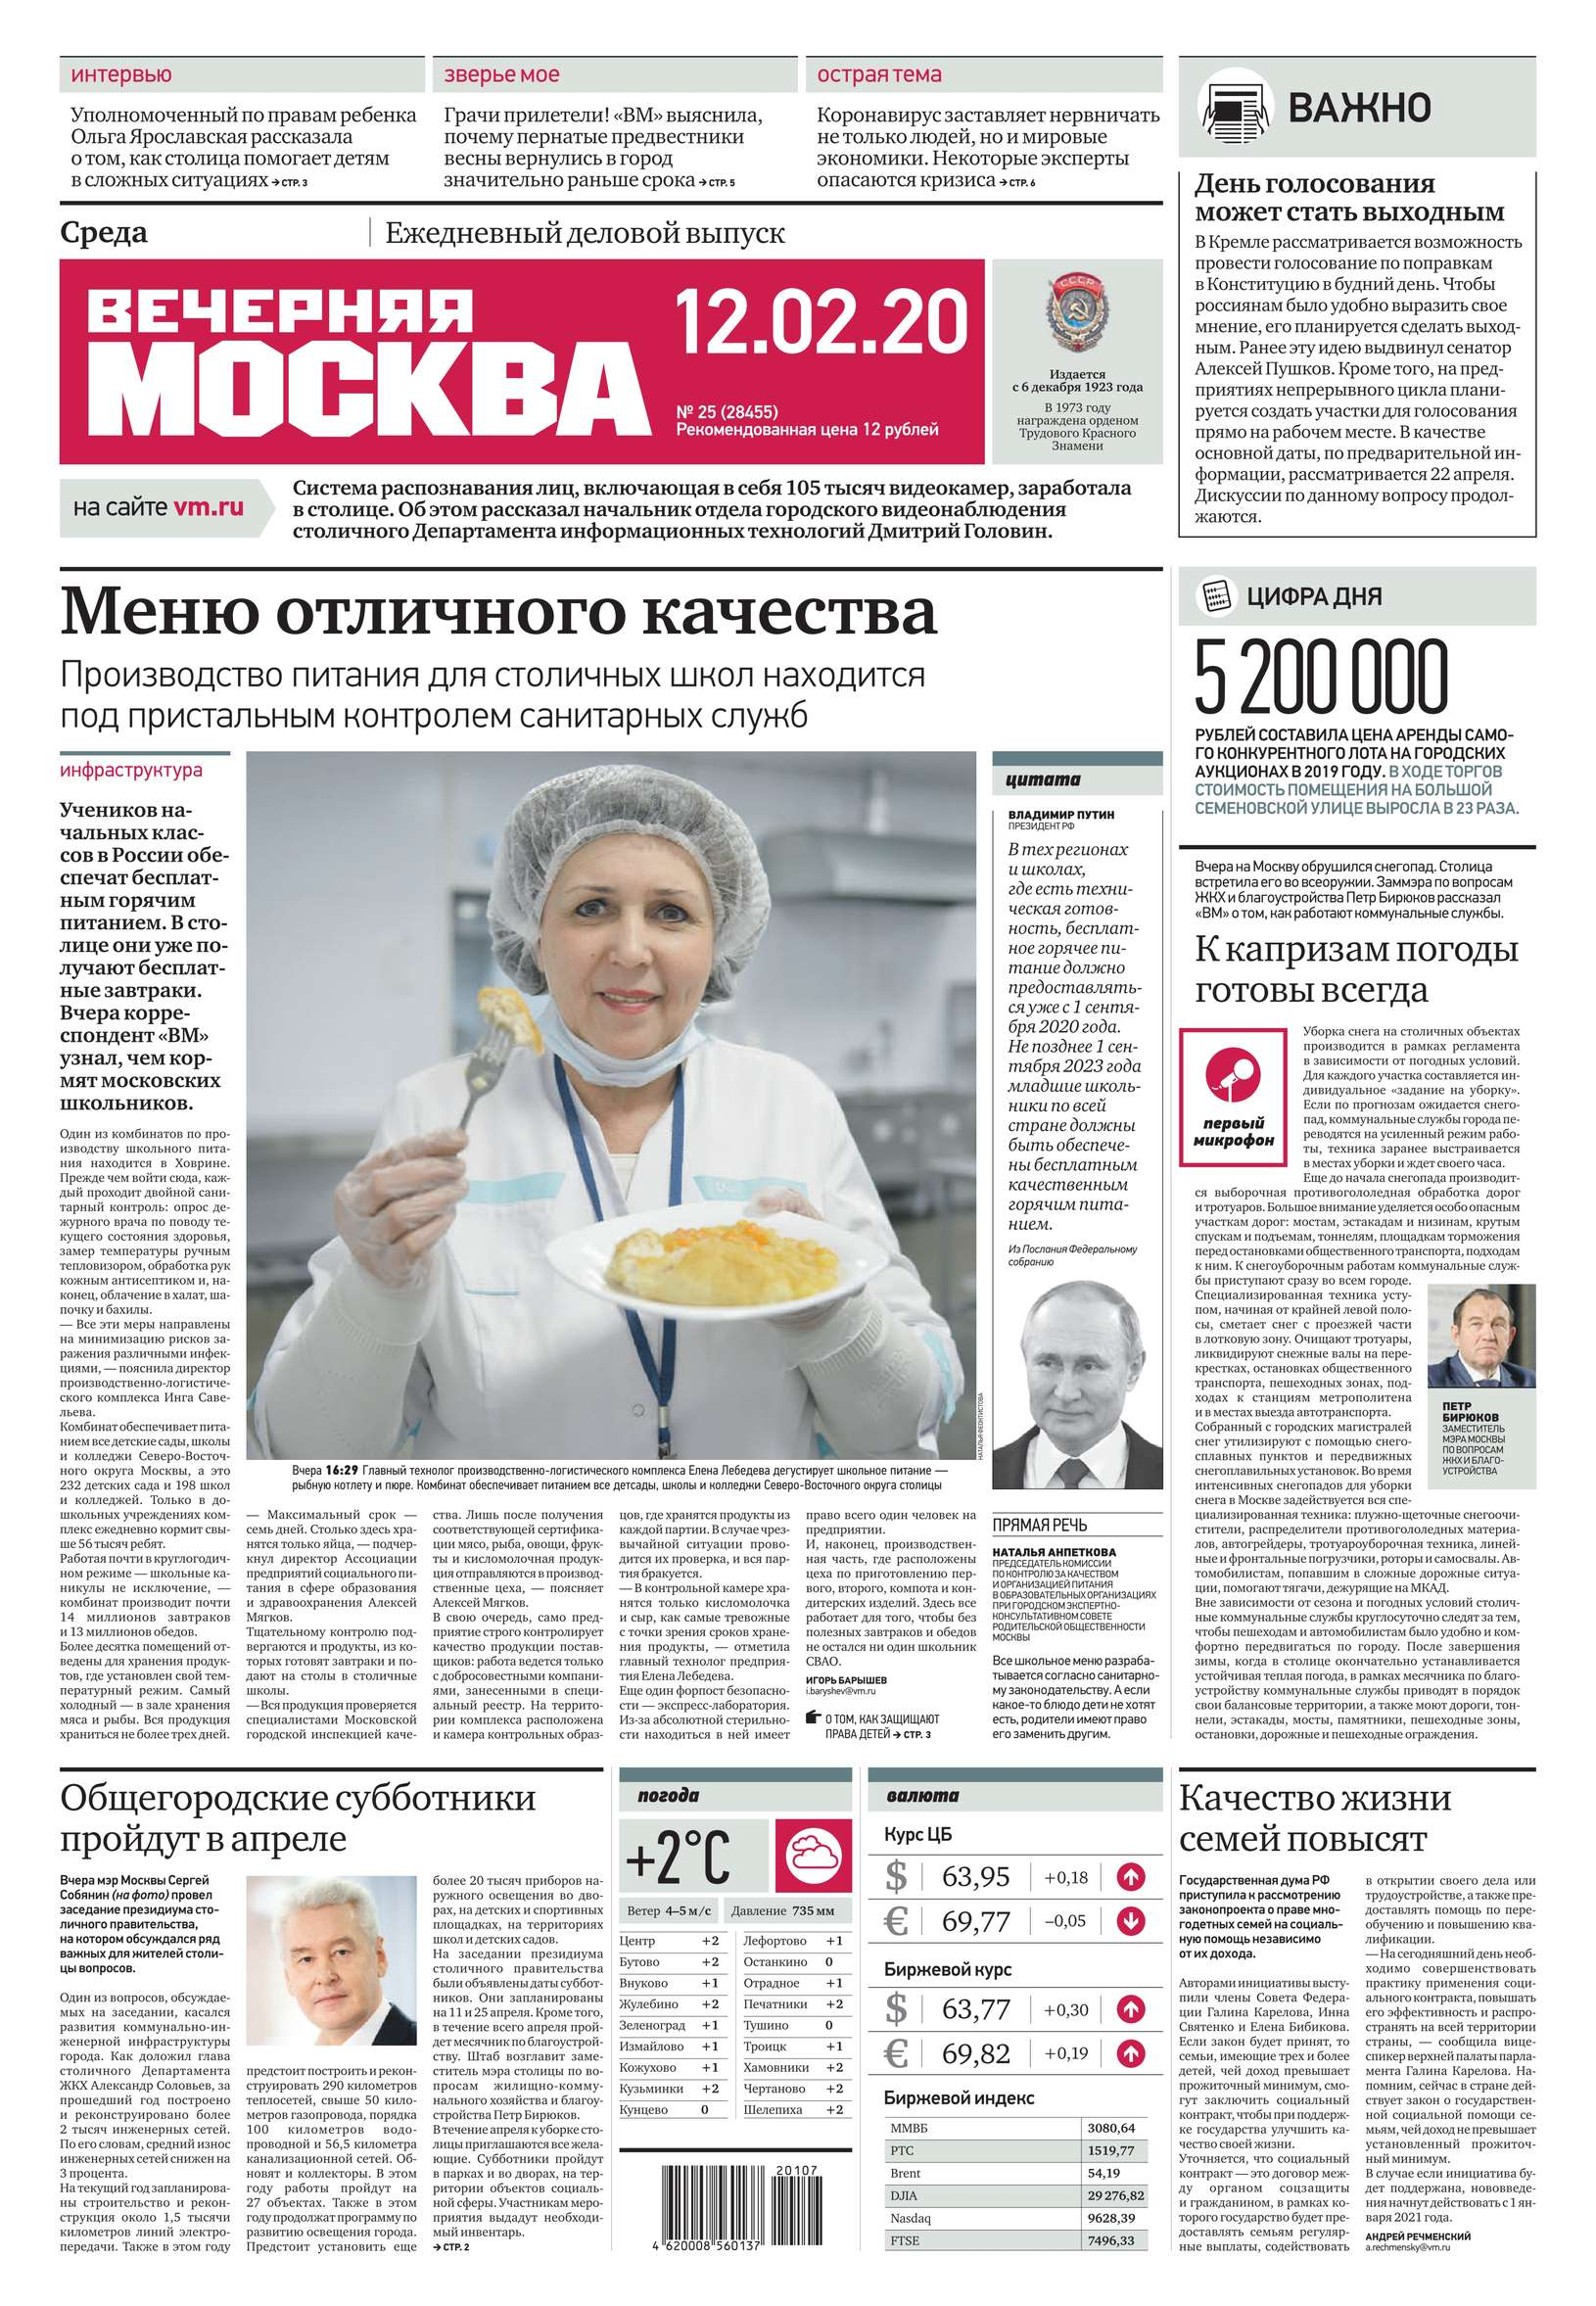 Редакция газеты Вечерняя Москва Вечерняя Москва 25-2020